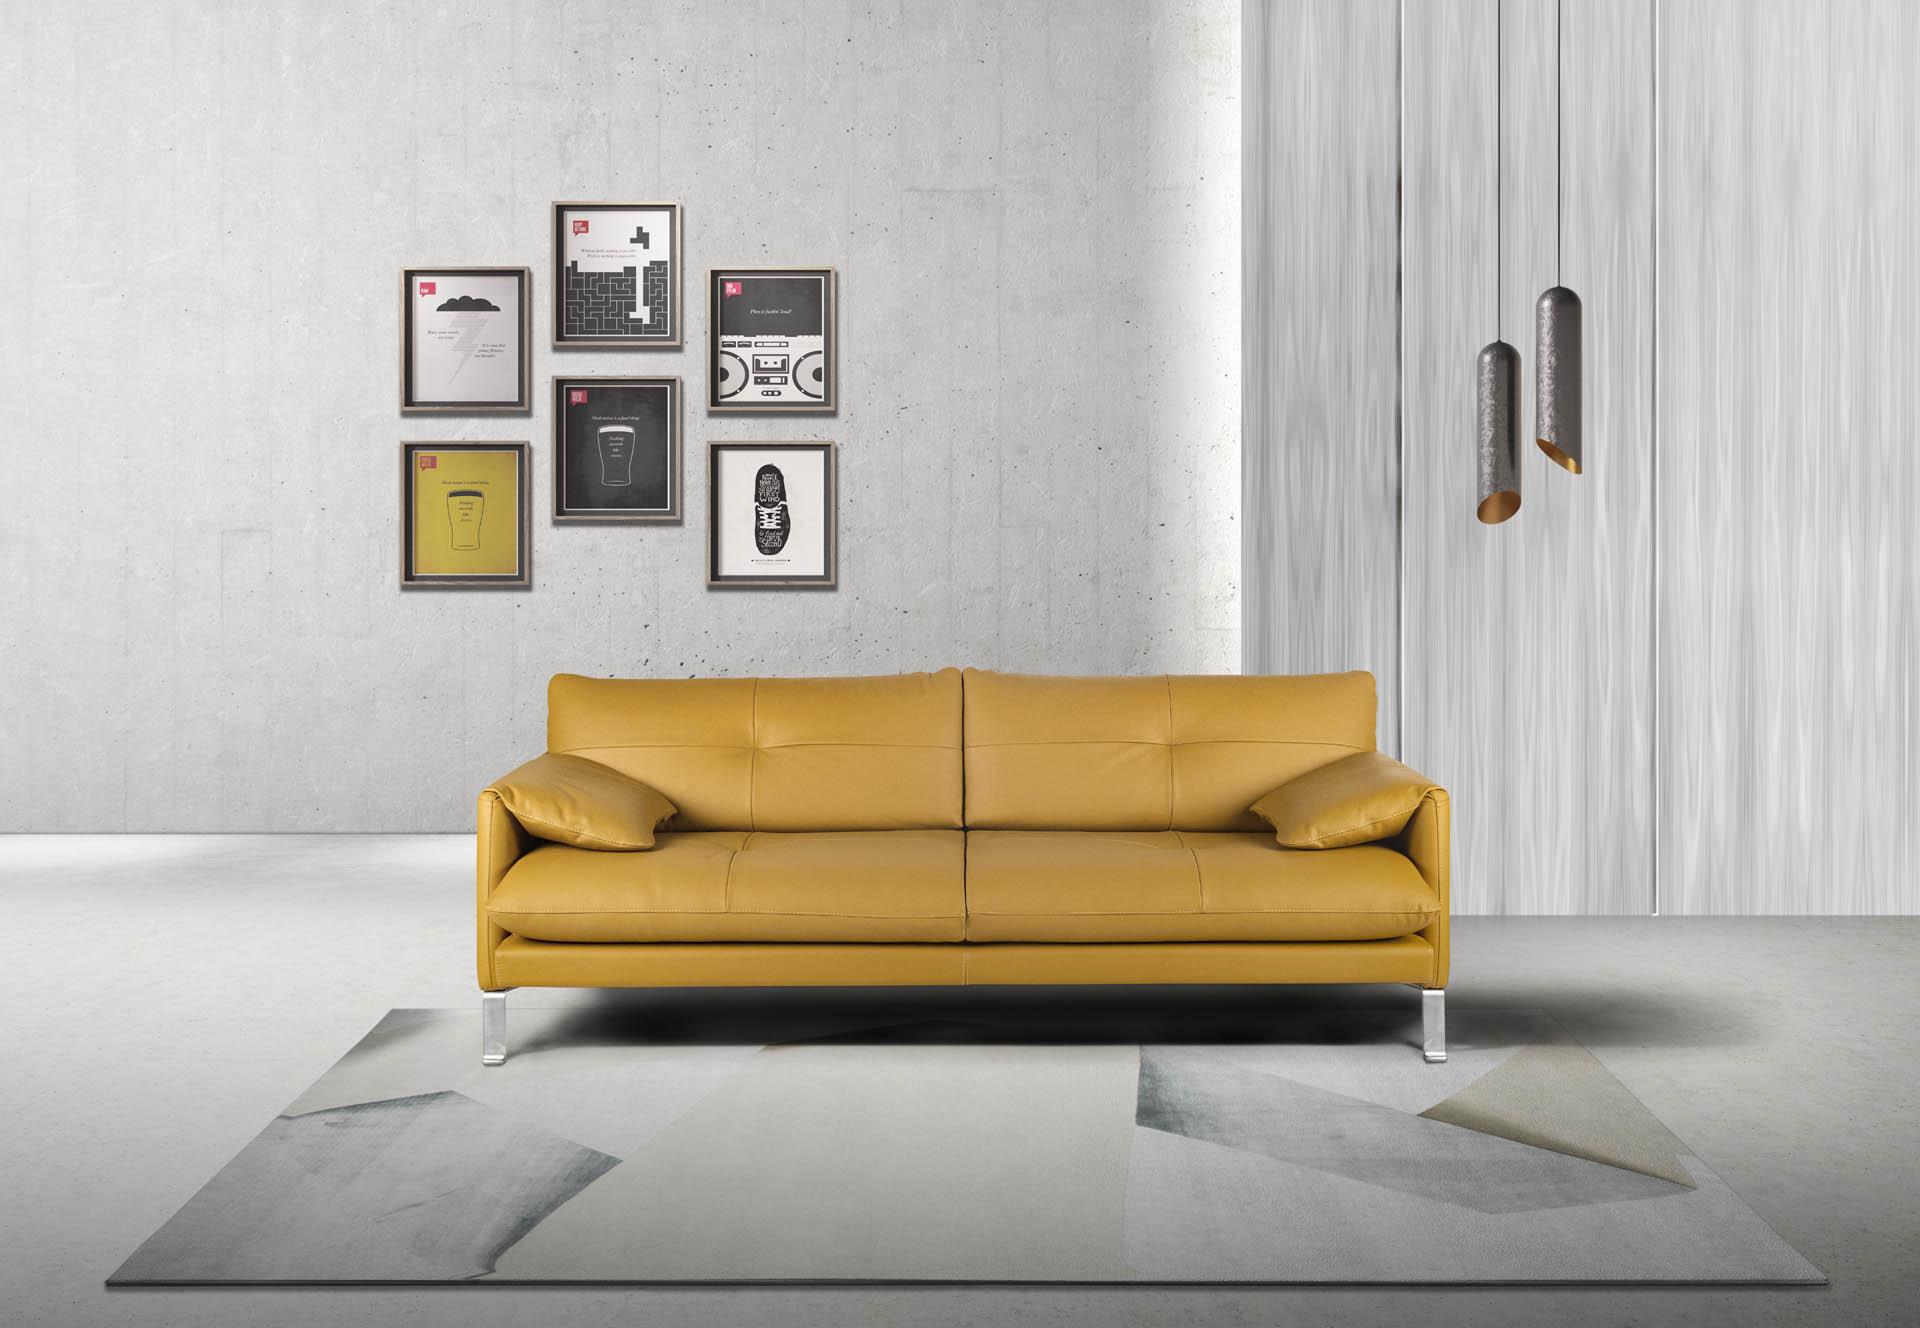 Leather Sofas Designer Estro Living Fabric Diven And Contemporary — E2IWH9YD